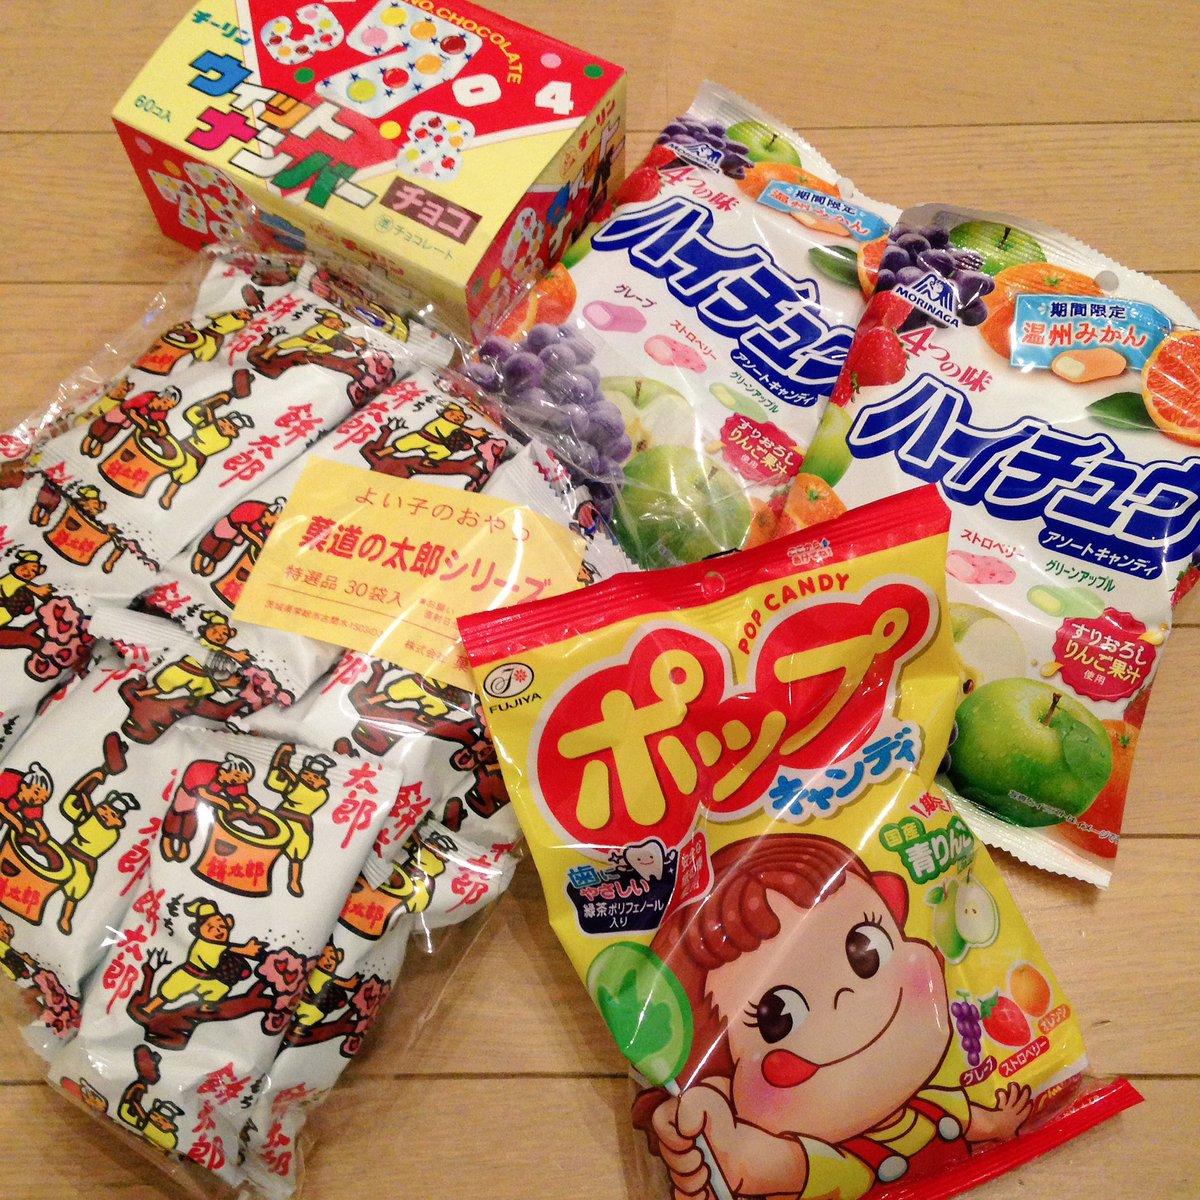 test ツイッターメディア - 今度、子どものクラスの子の送別会ピクニックをするんだけど、役員なのでプレゼントとオヤツを用意した。プレゼントは本人が喜びそうで長く遊べるミニ四駆+お菓子セット。当日のオヤツはケンカにならないよう小包装。準備万端だ✨ https://t.co/6jb3UFPfh4